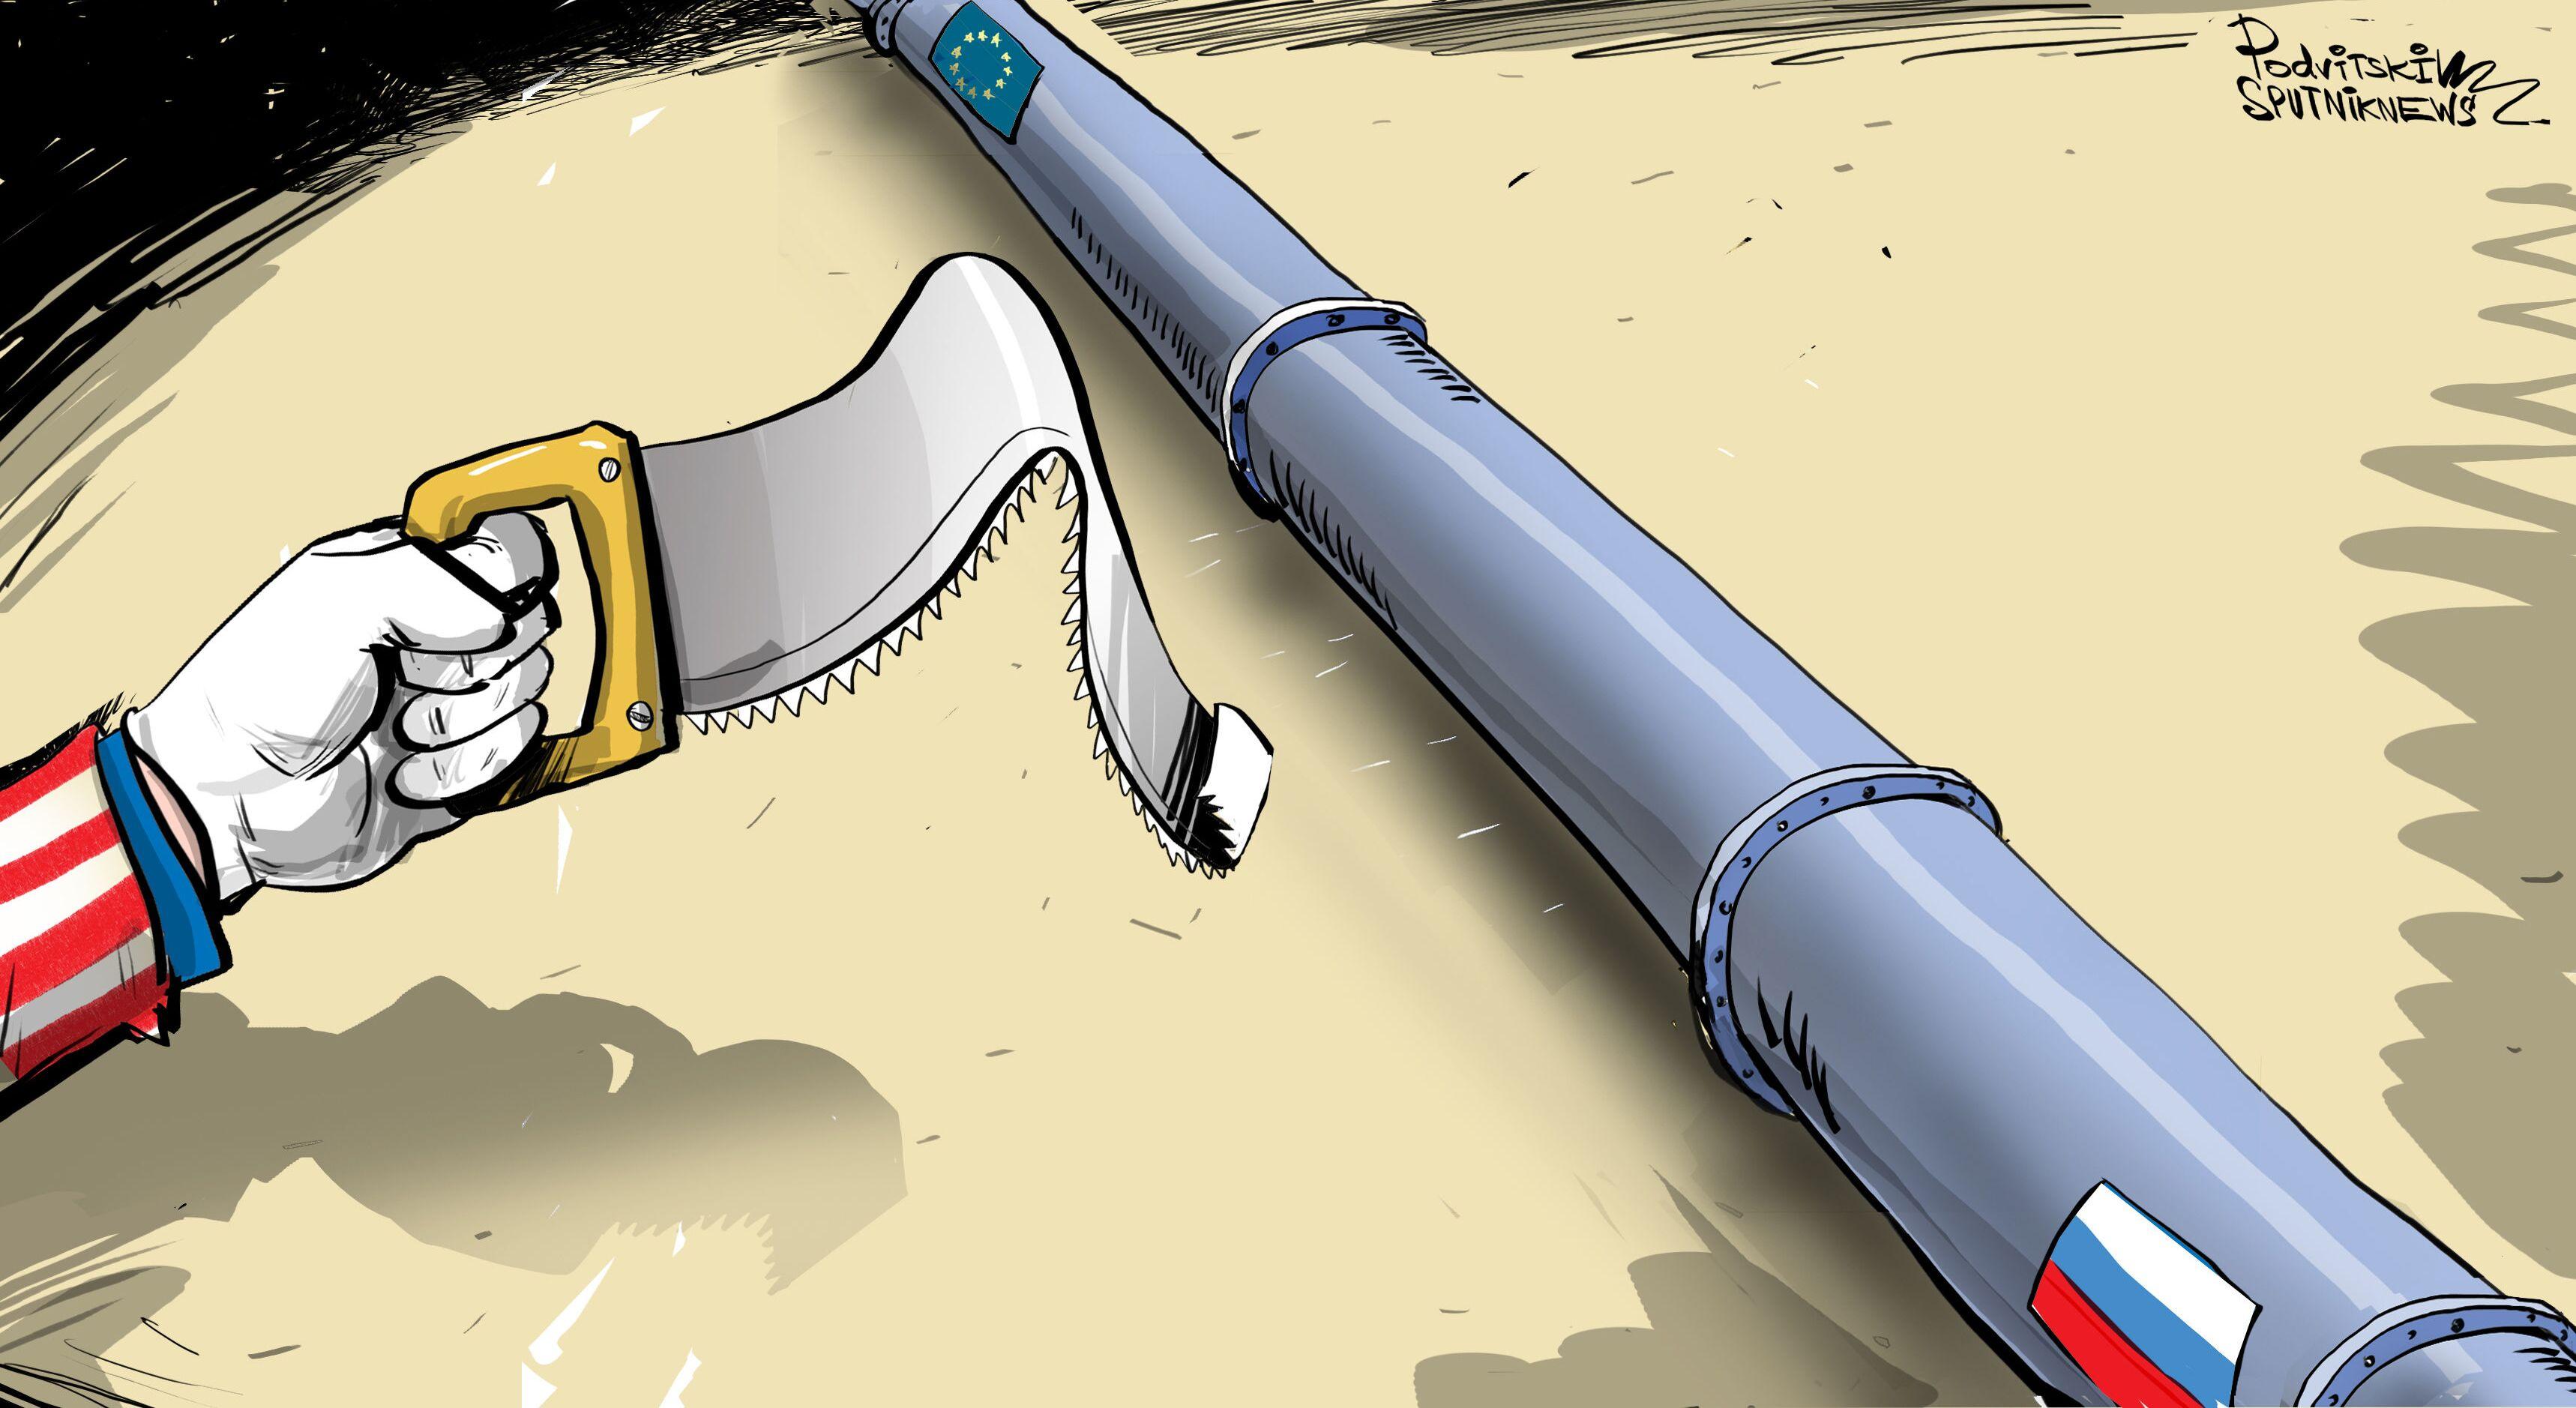 V USA uznali, že sankce nepozastaví Nord Stream 2.